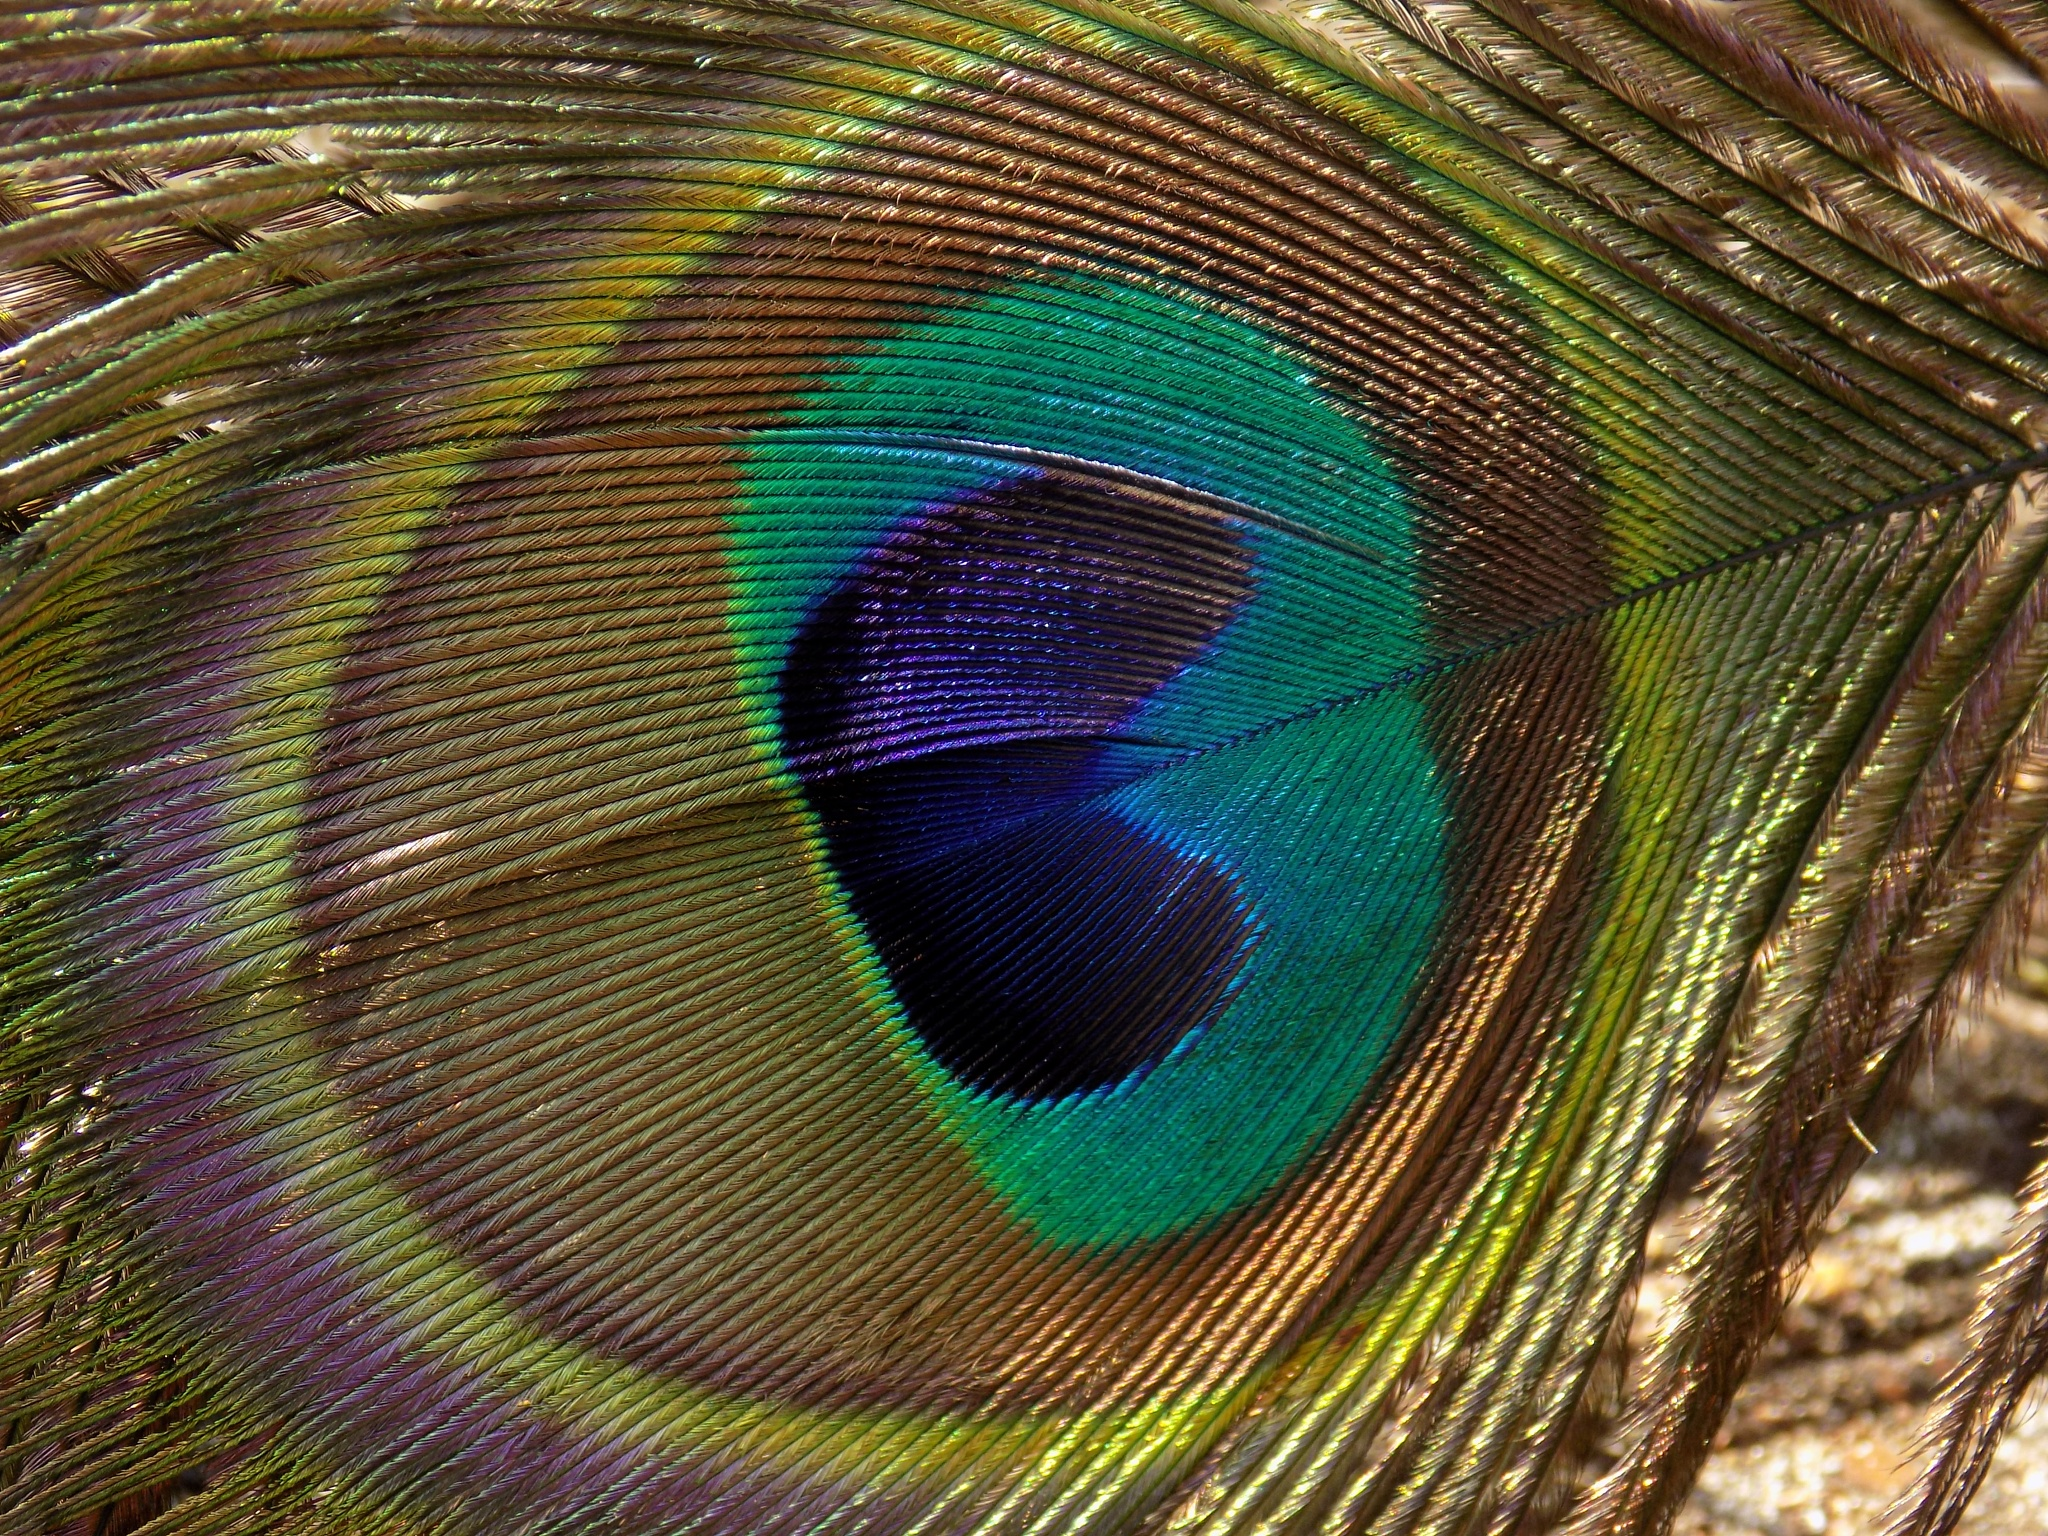 Peacock feather by Elaine Twyman